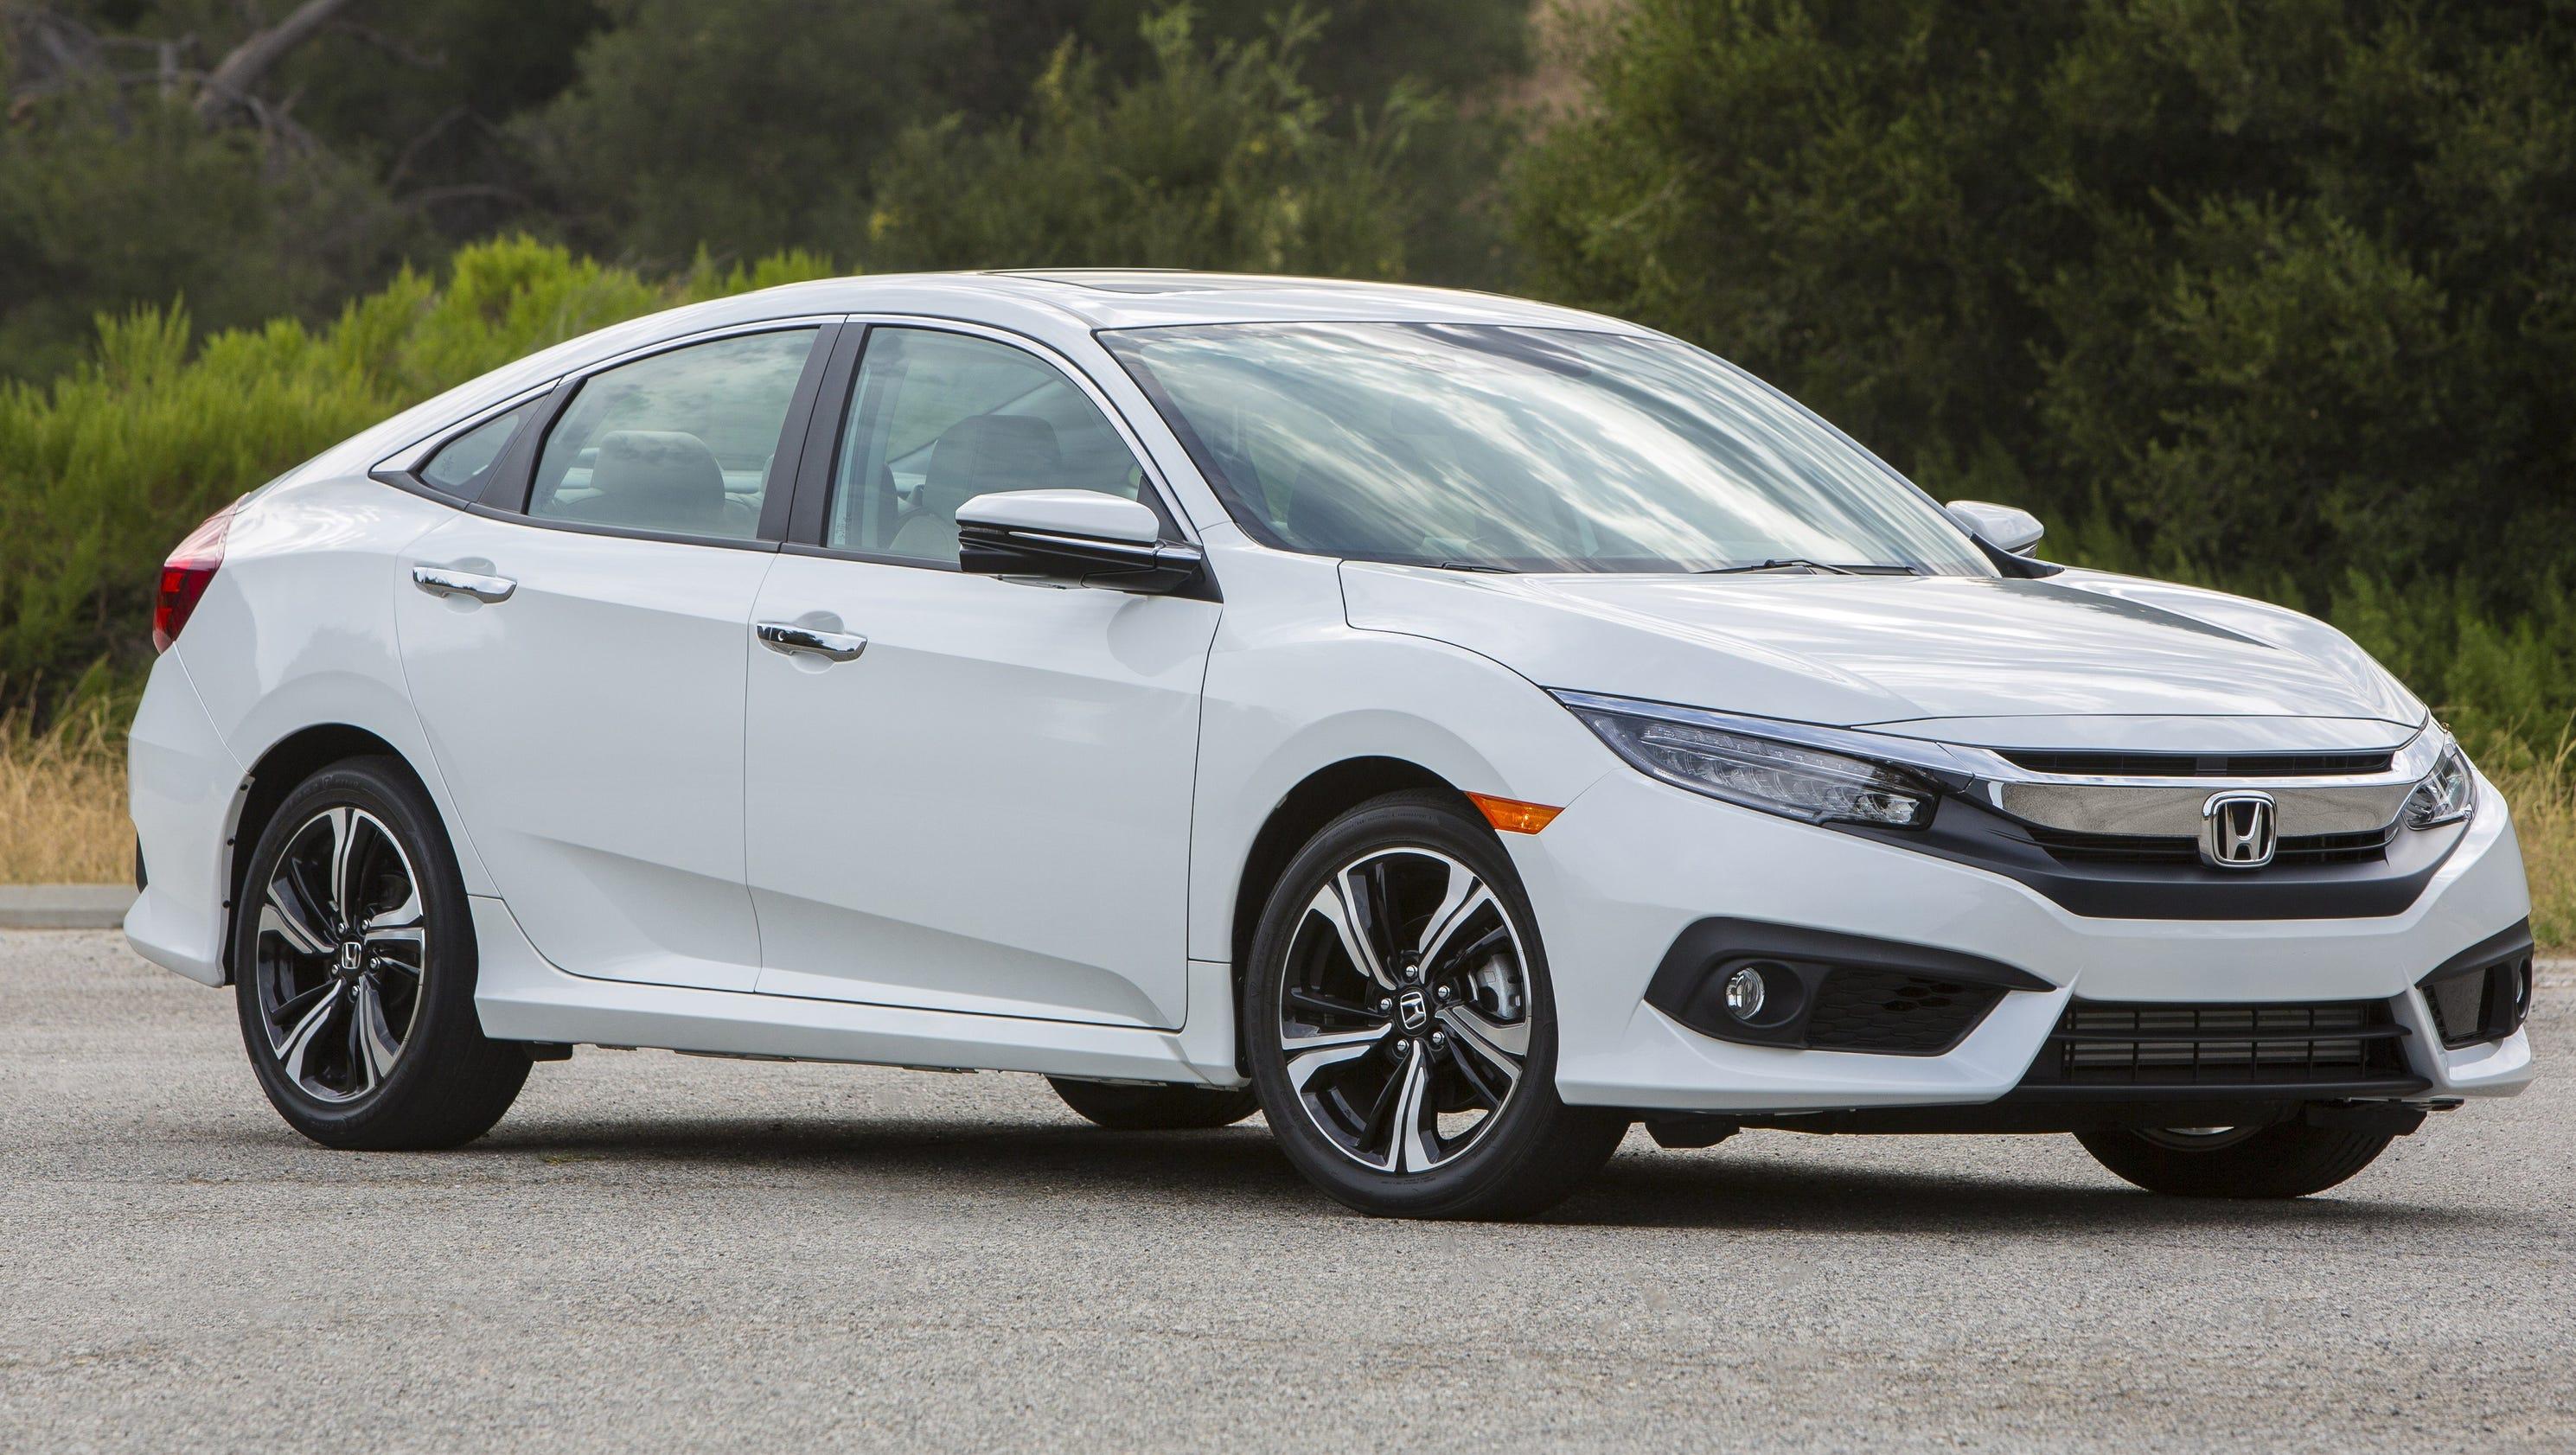 New Honda Civic >> New, bigger Honda Civic breaks 40 mpg barrier